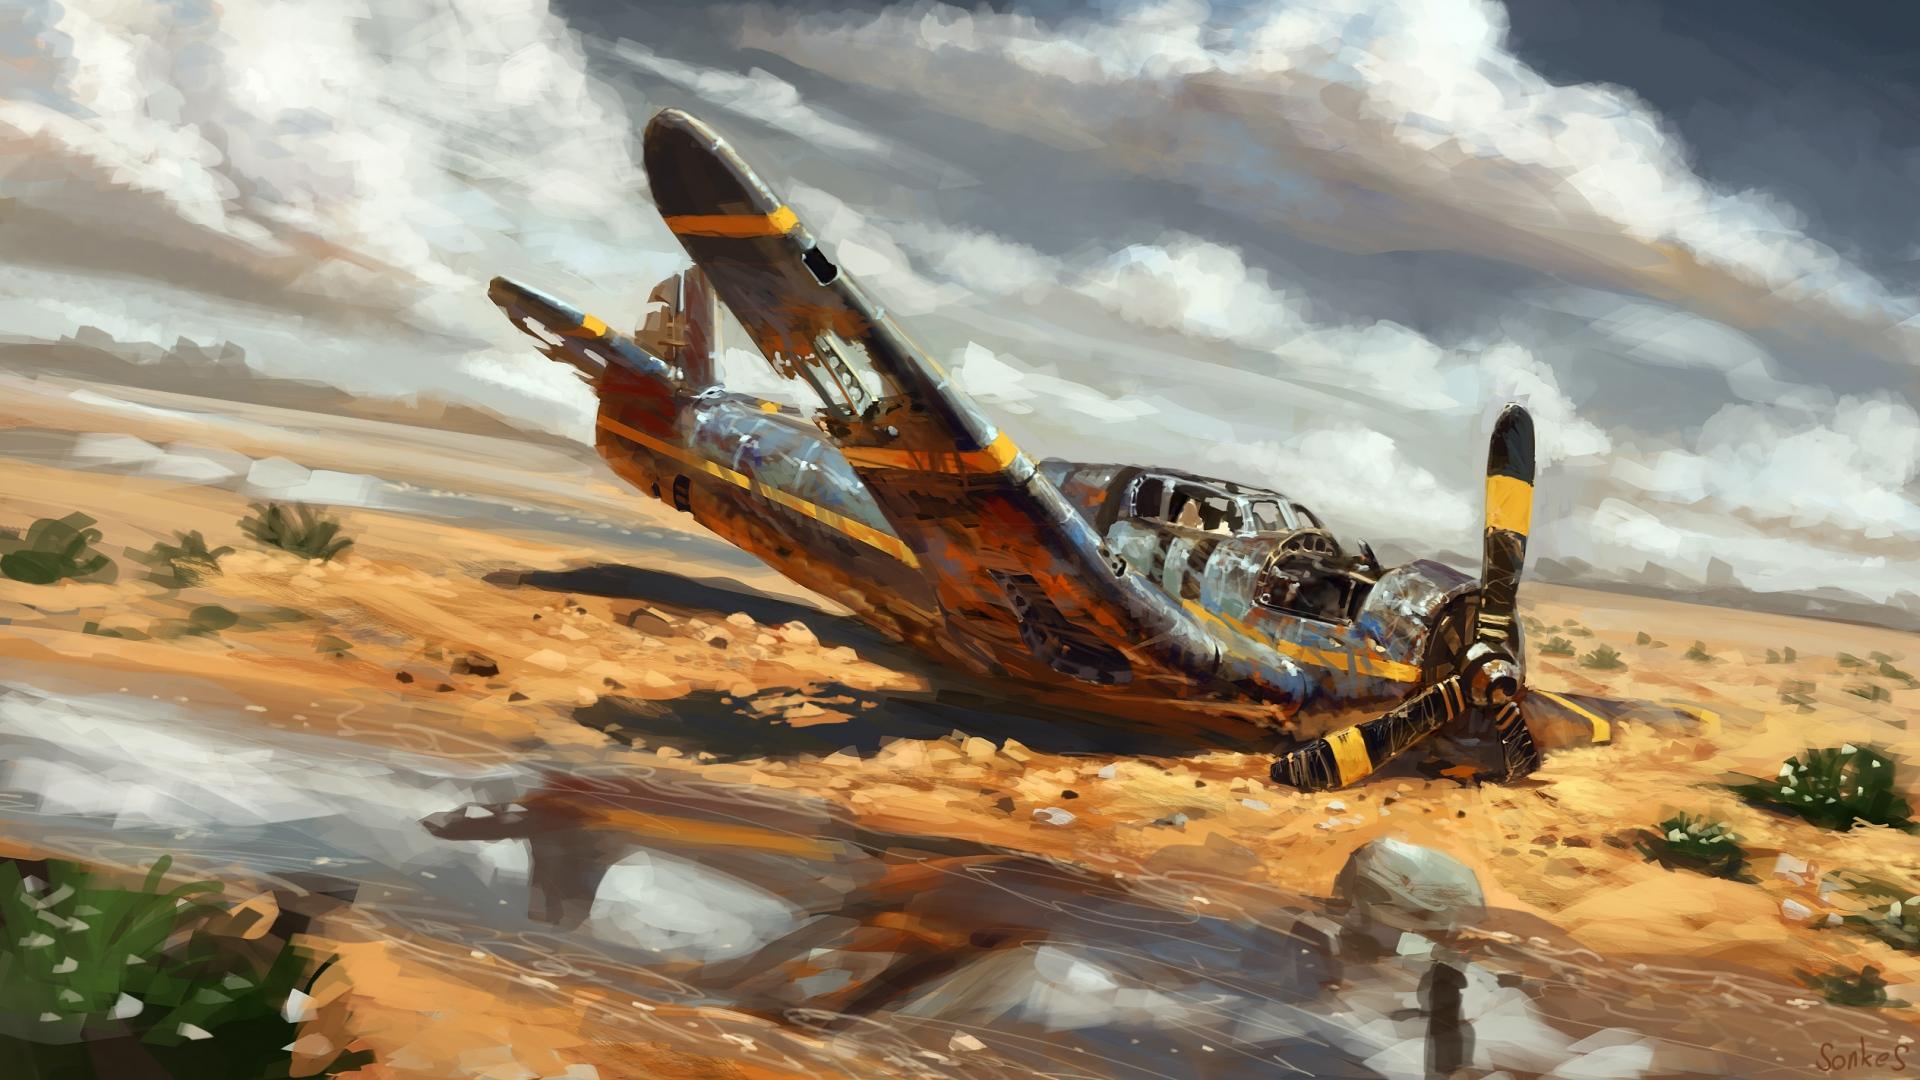 Playstation 4 aircraft games crash to desktop